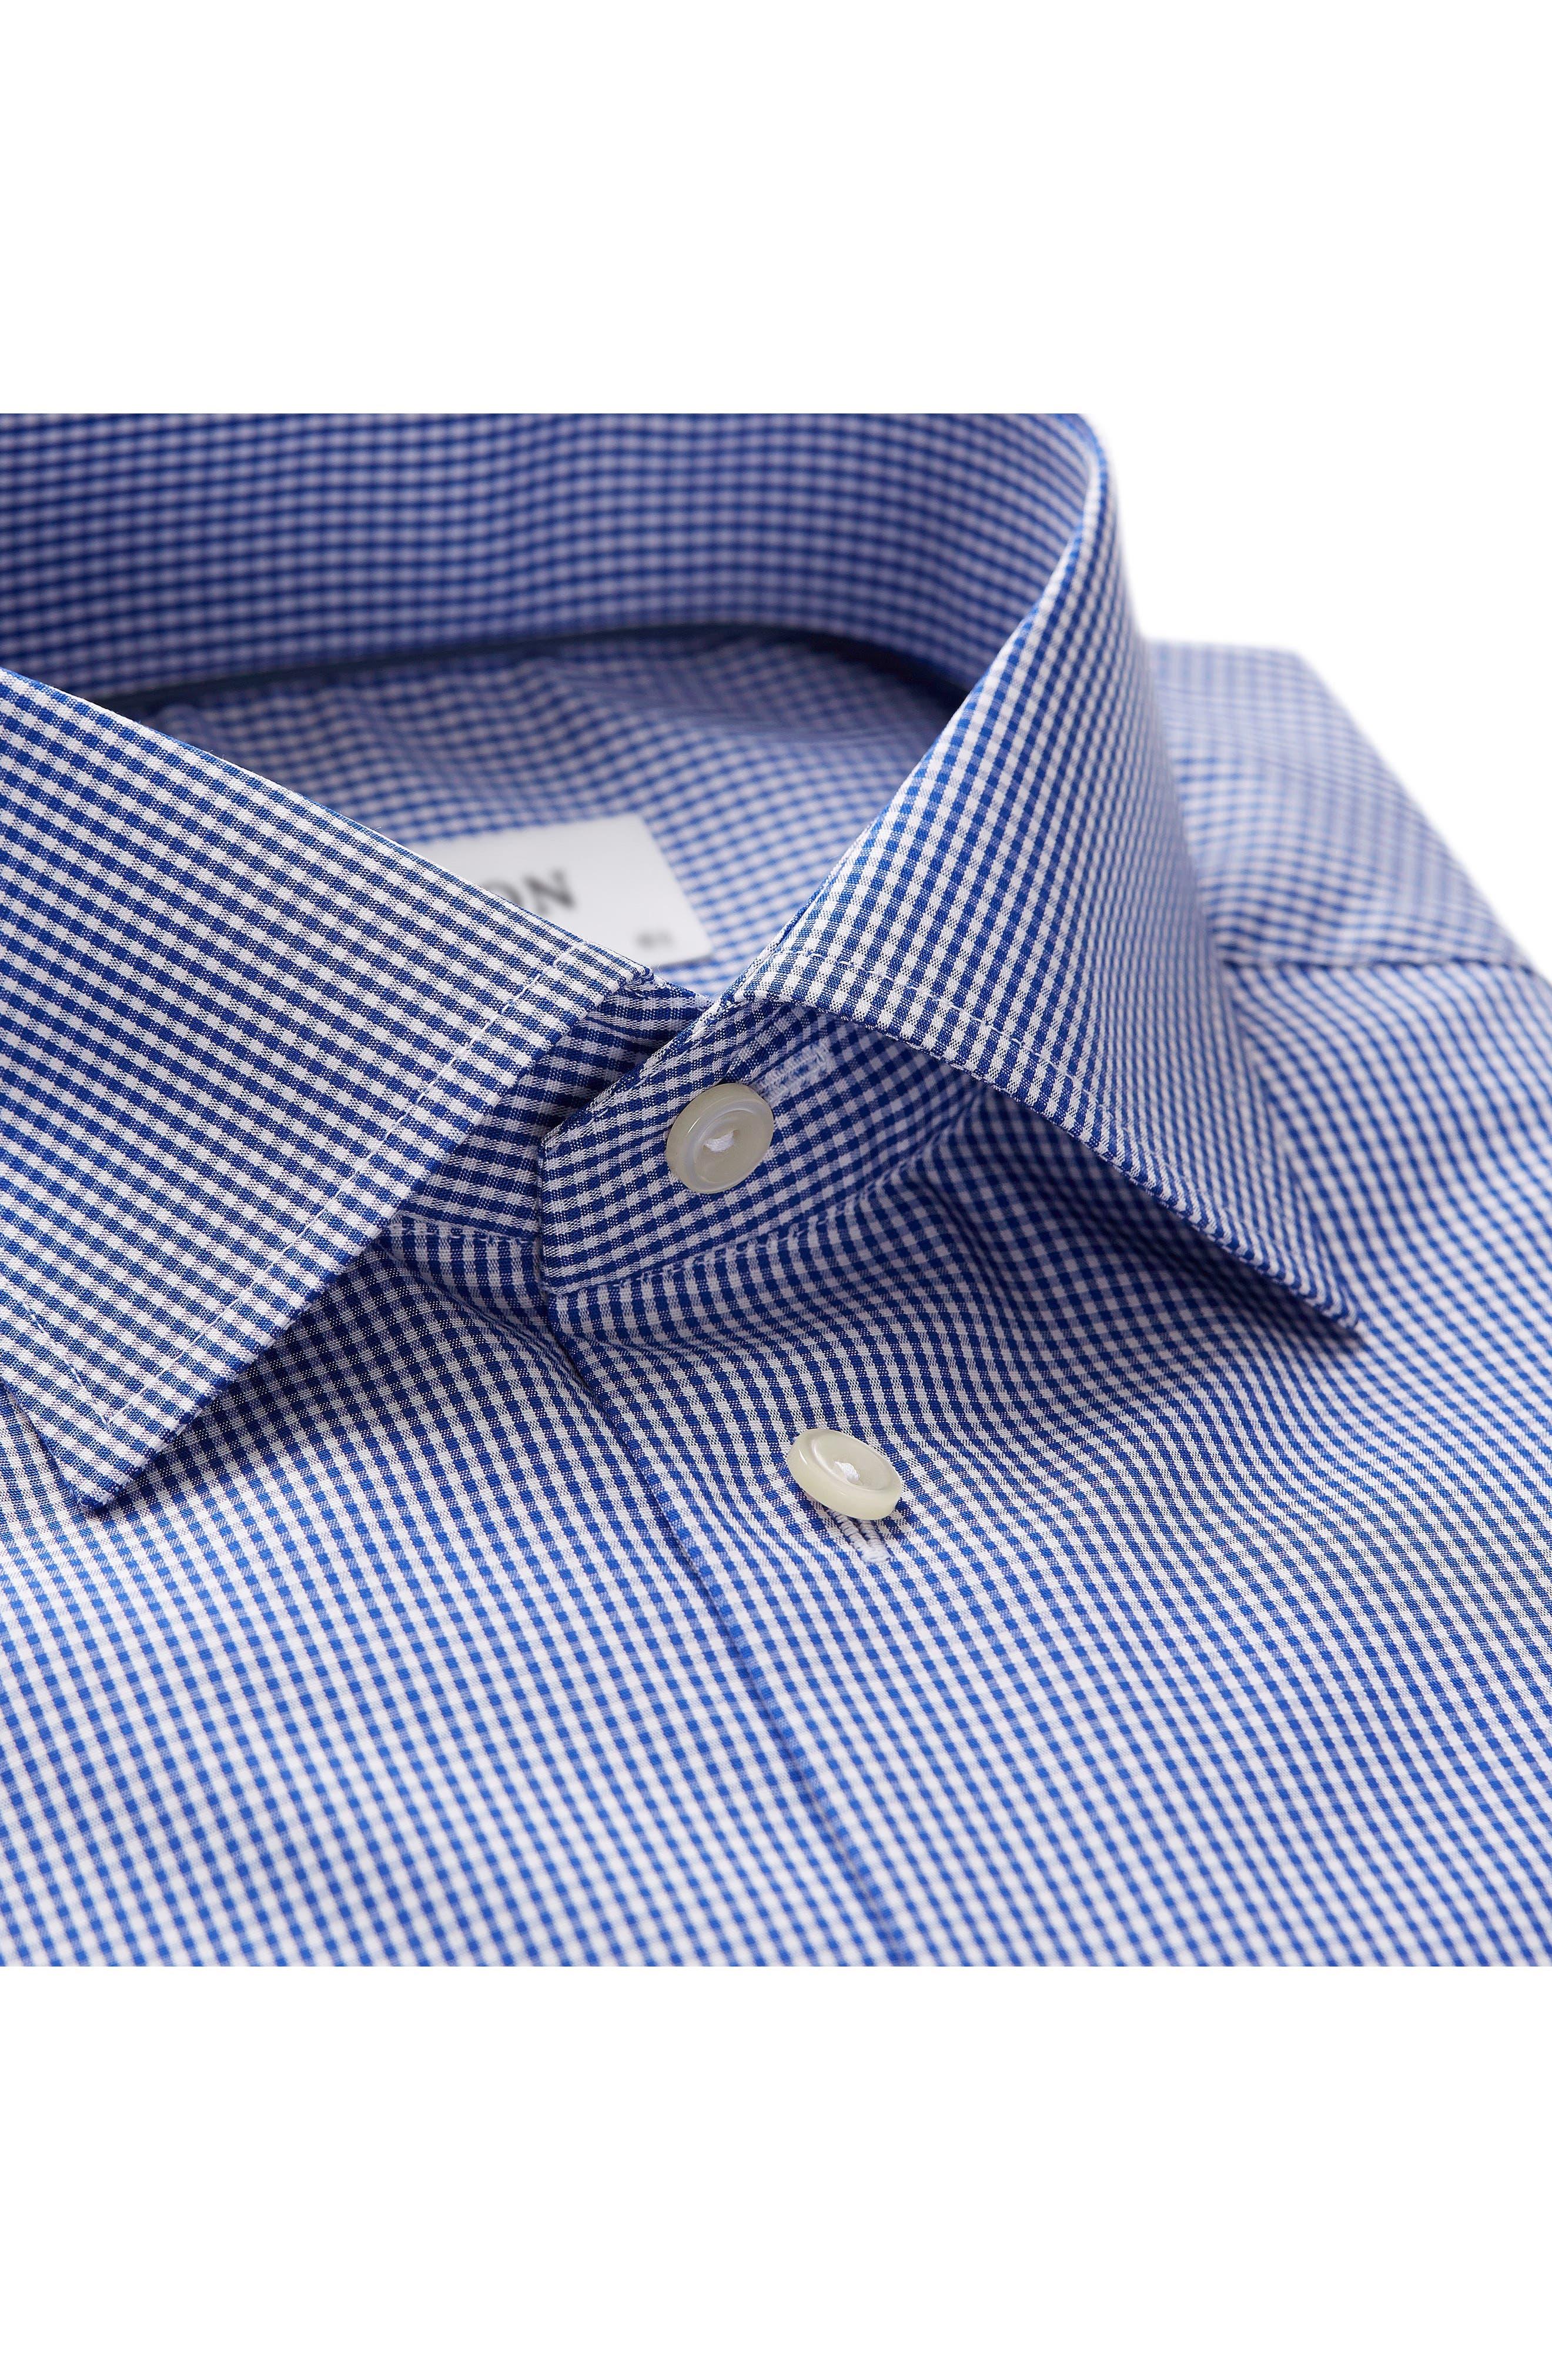 Contemporary Fit Check Dress Shirt,                             Alternate thumbnail 2, color,                             Mid Blue